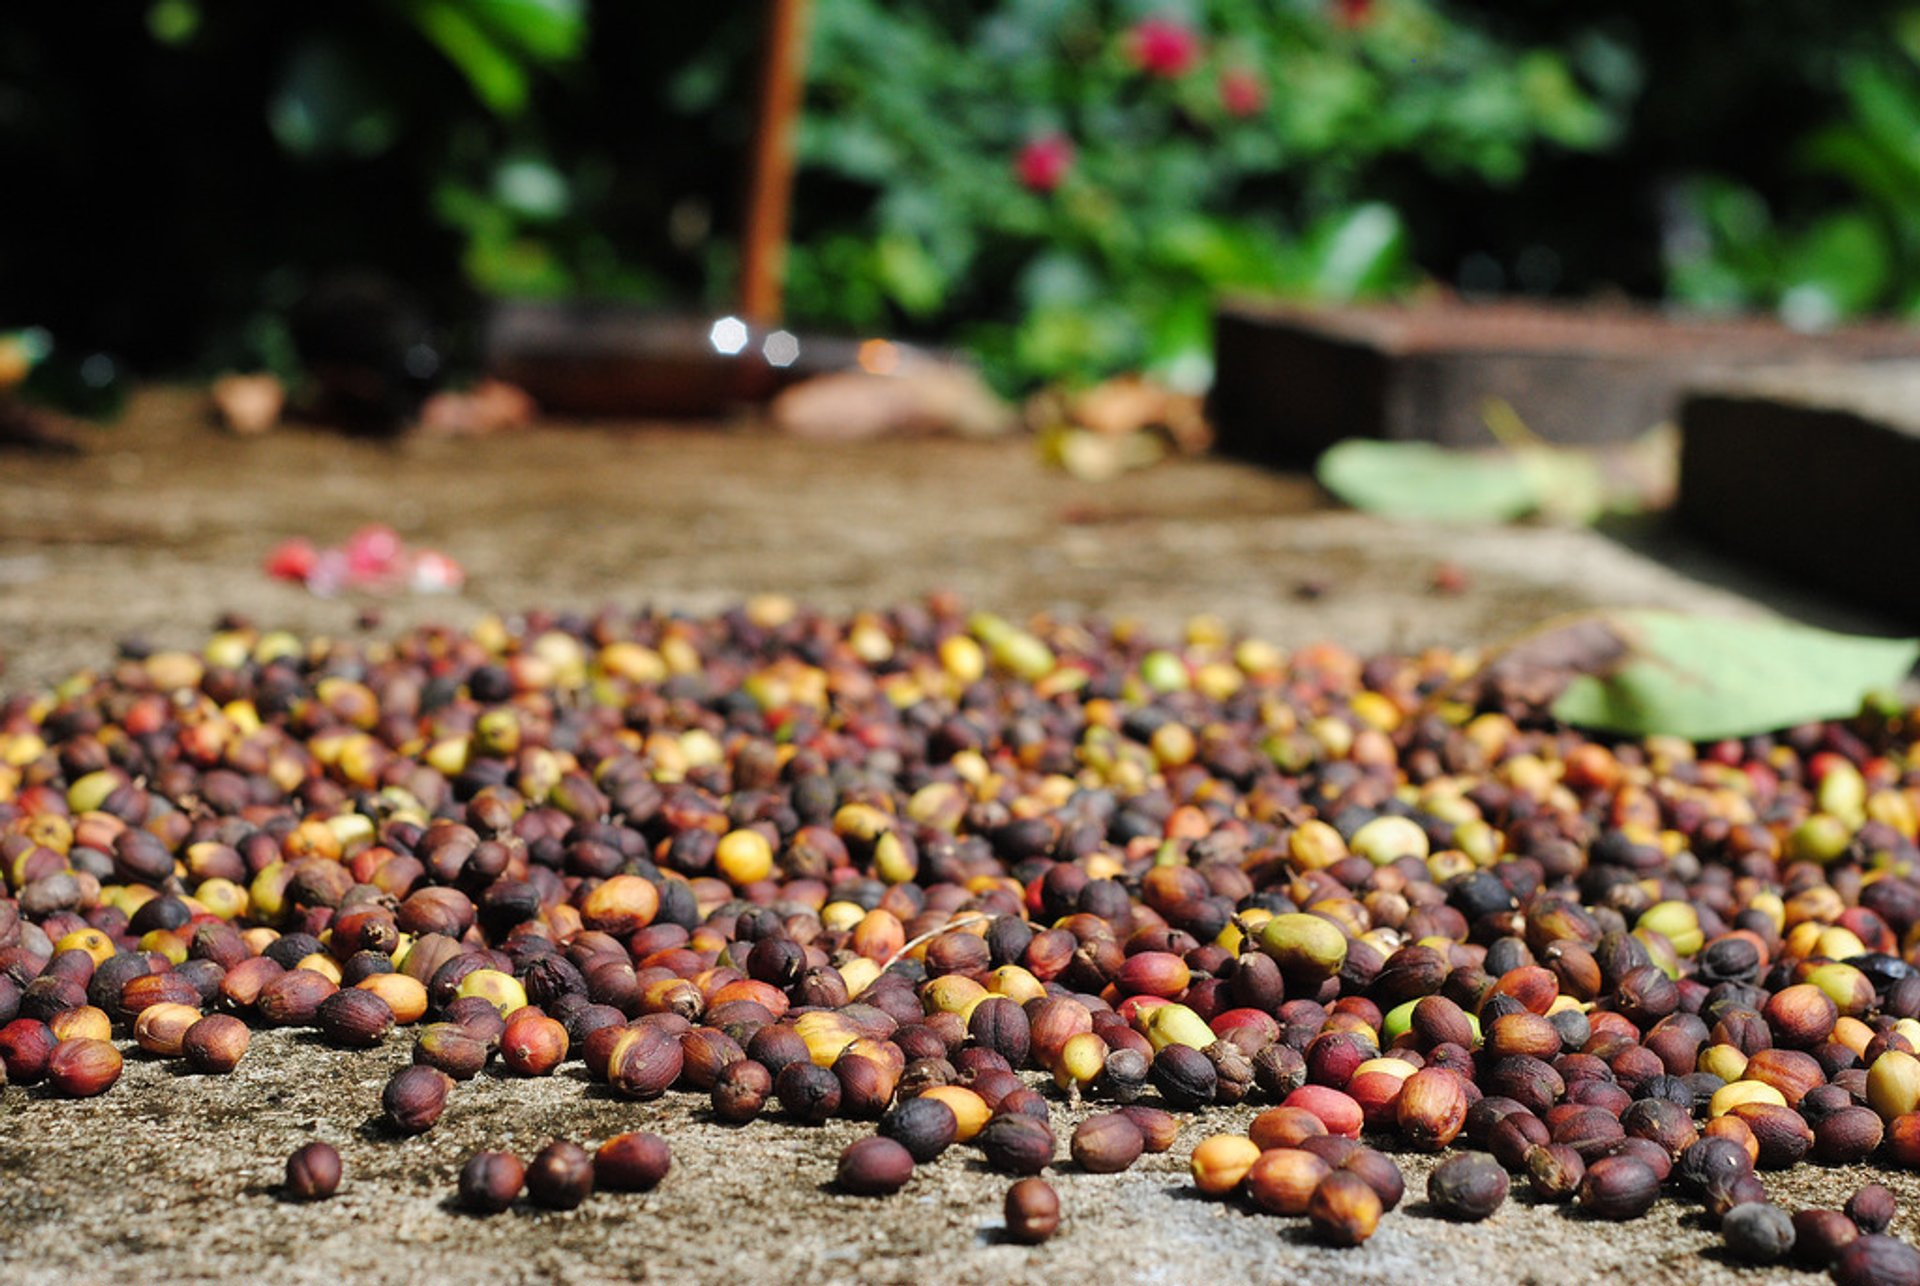 Coffee beans 2020